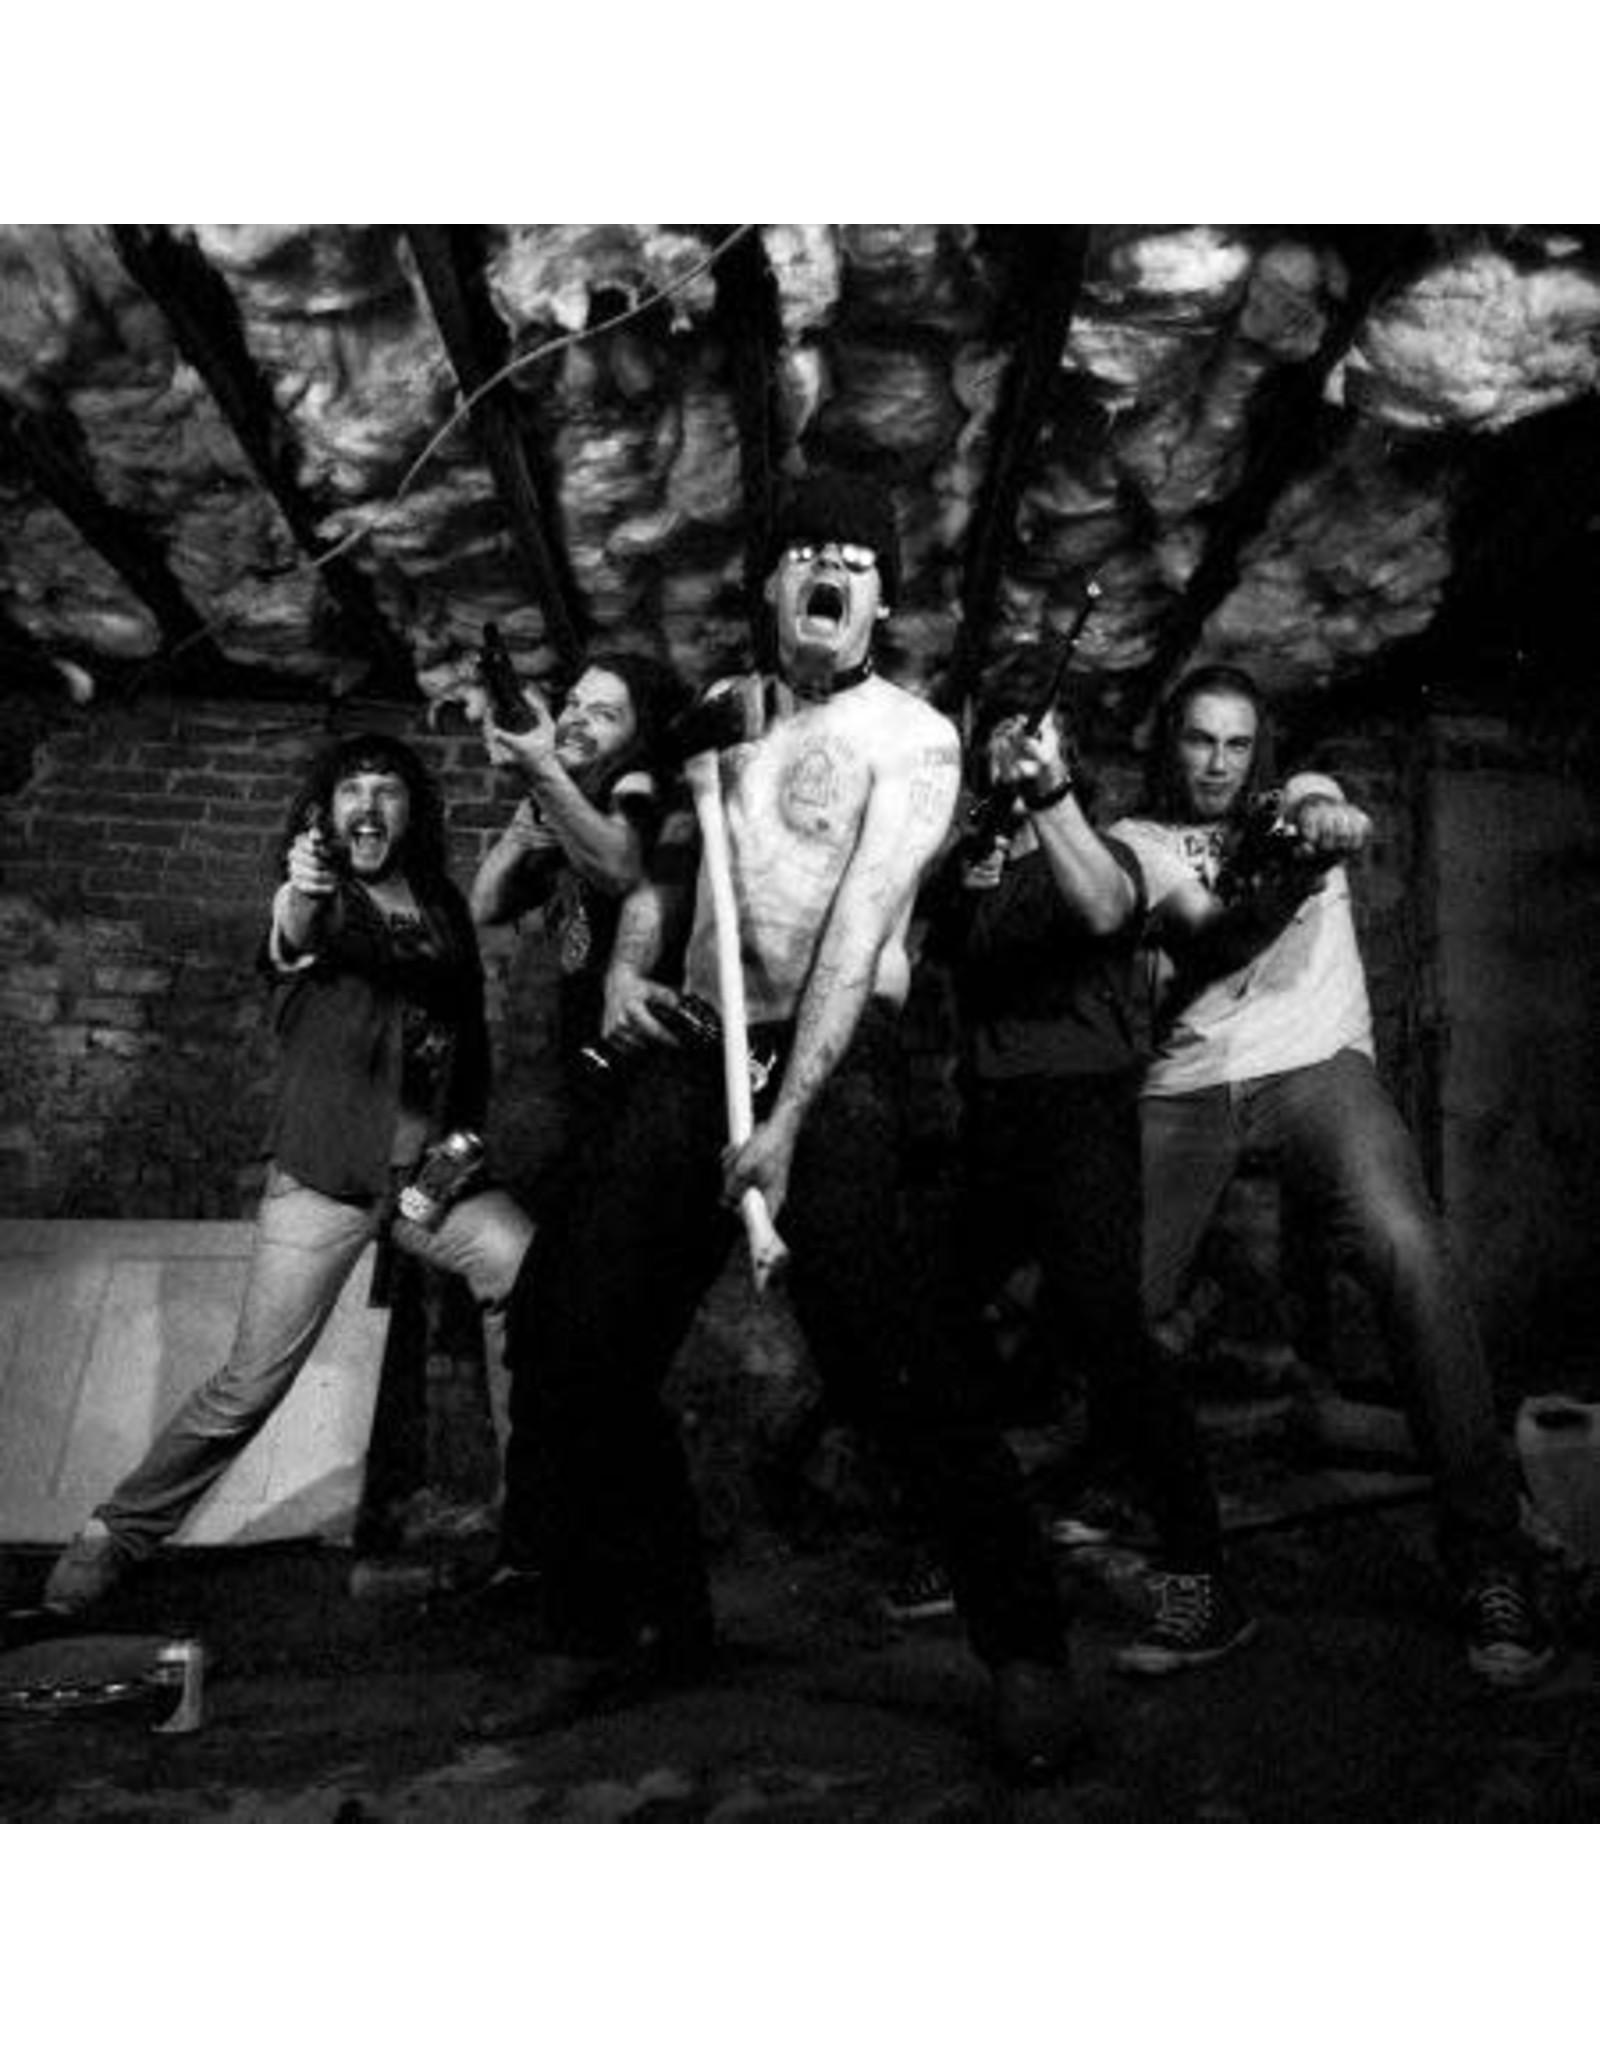 New Vinyl G.G. Allin & Antiseen - Murder Junkies LP